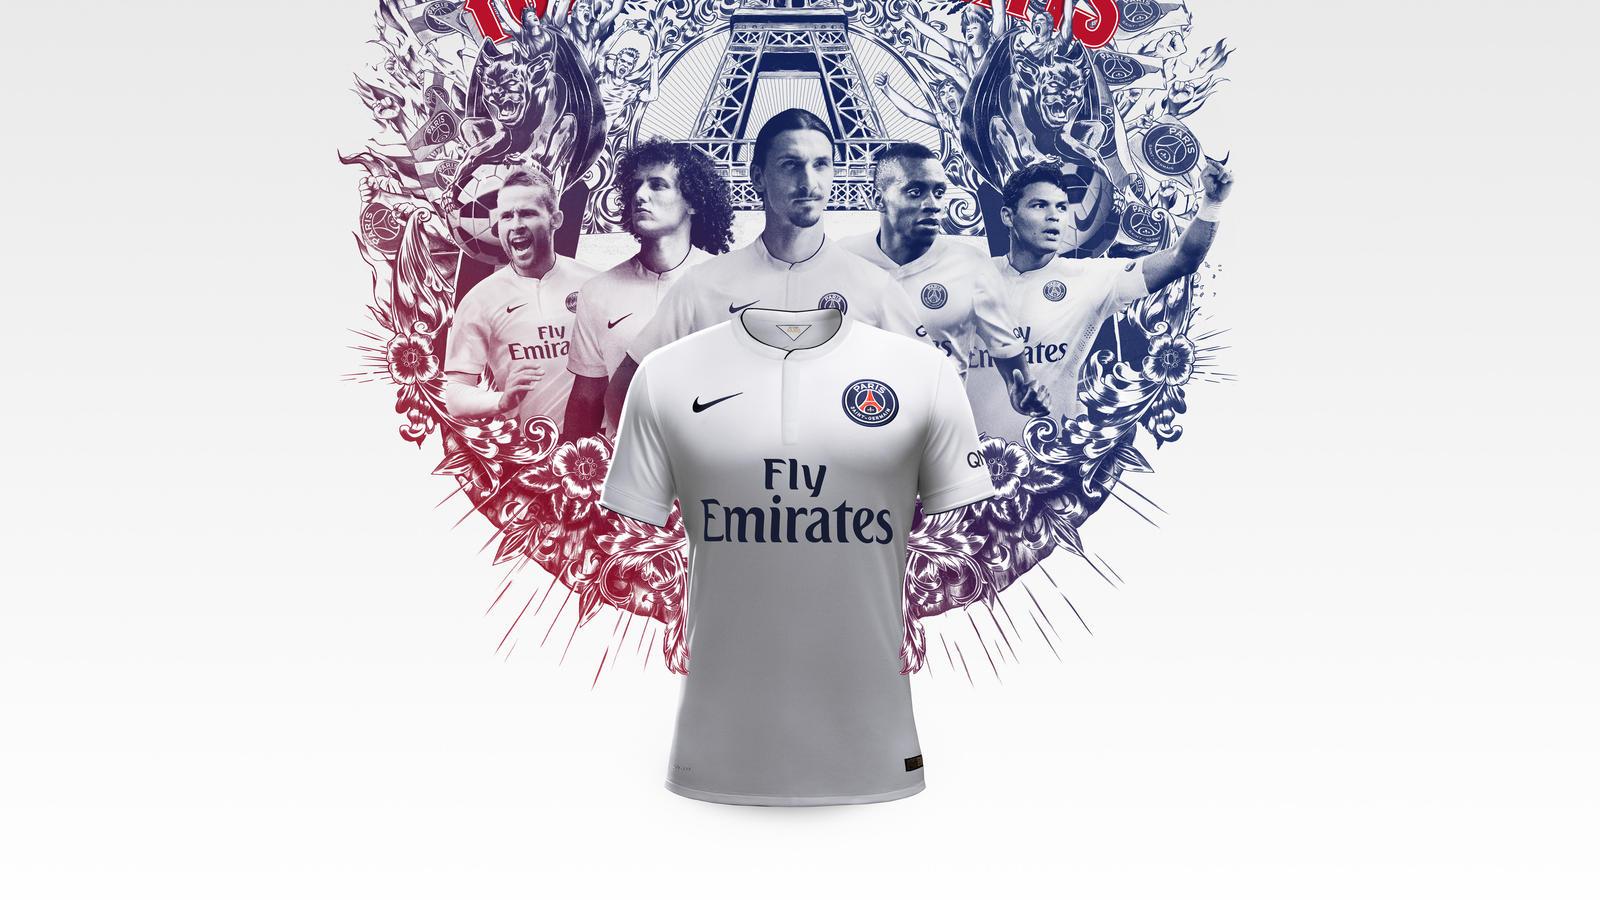 Gfb Club Kits Psg Hollow Shirt Group Illo Away F